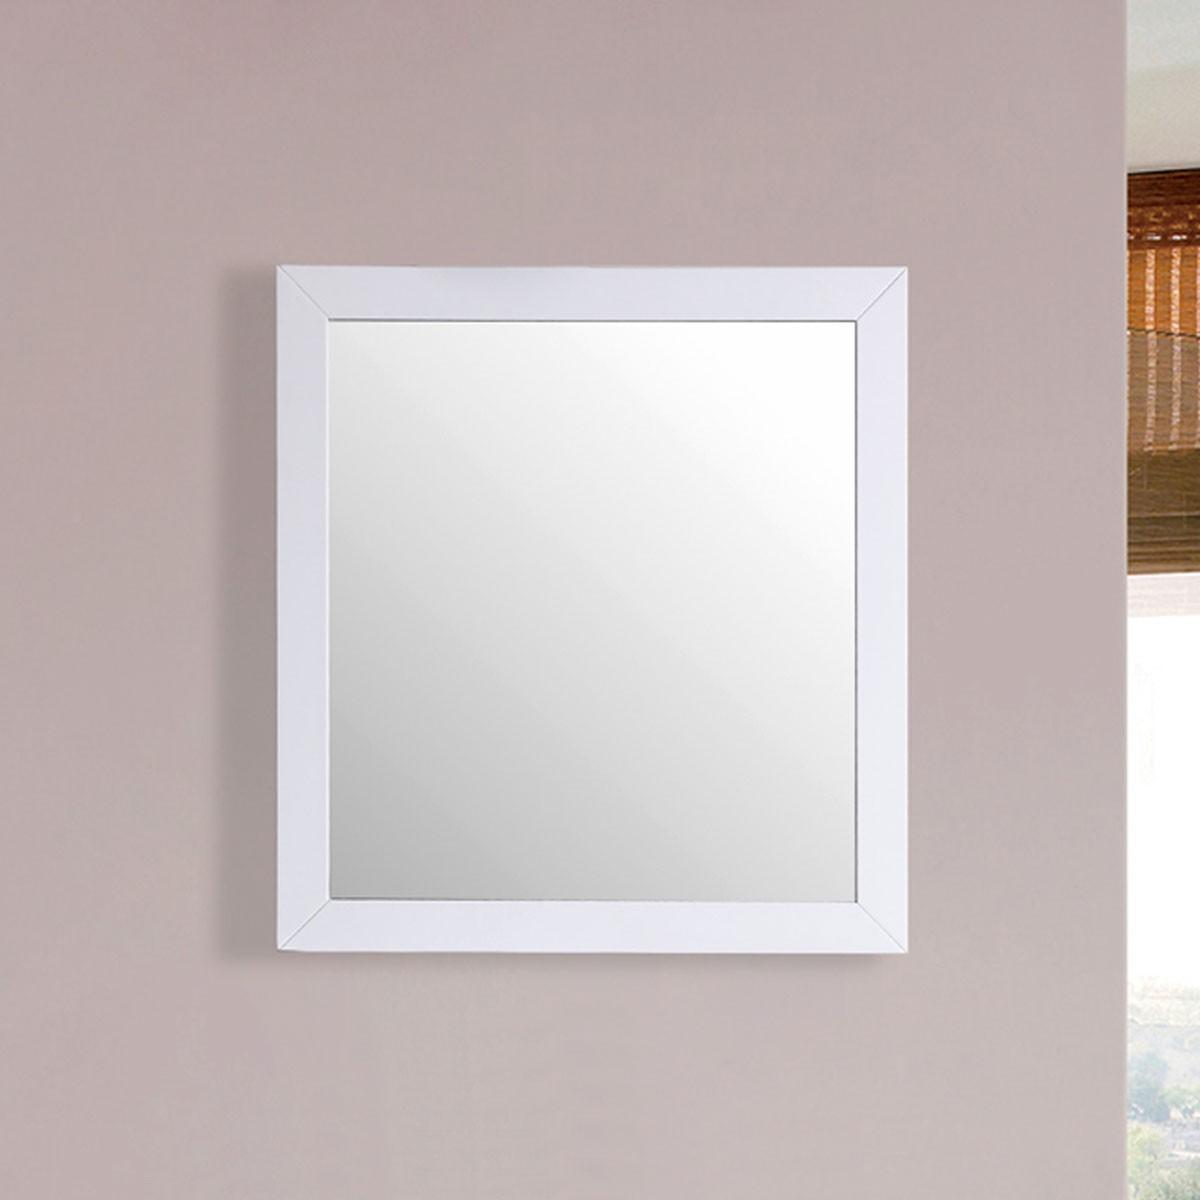 30 x 31 po Miroir avec cadre blanc (DK-T9312-30WM)